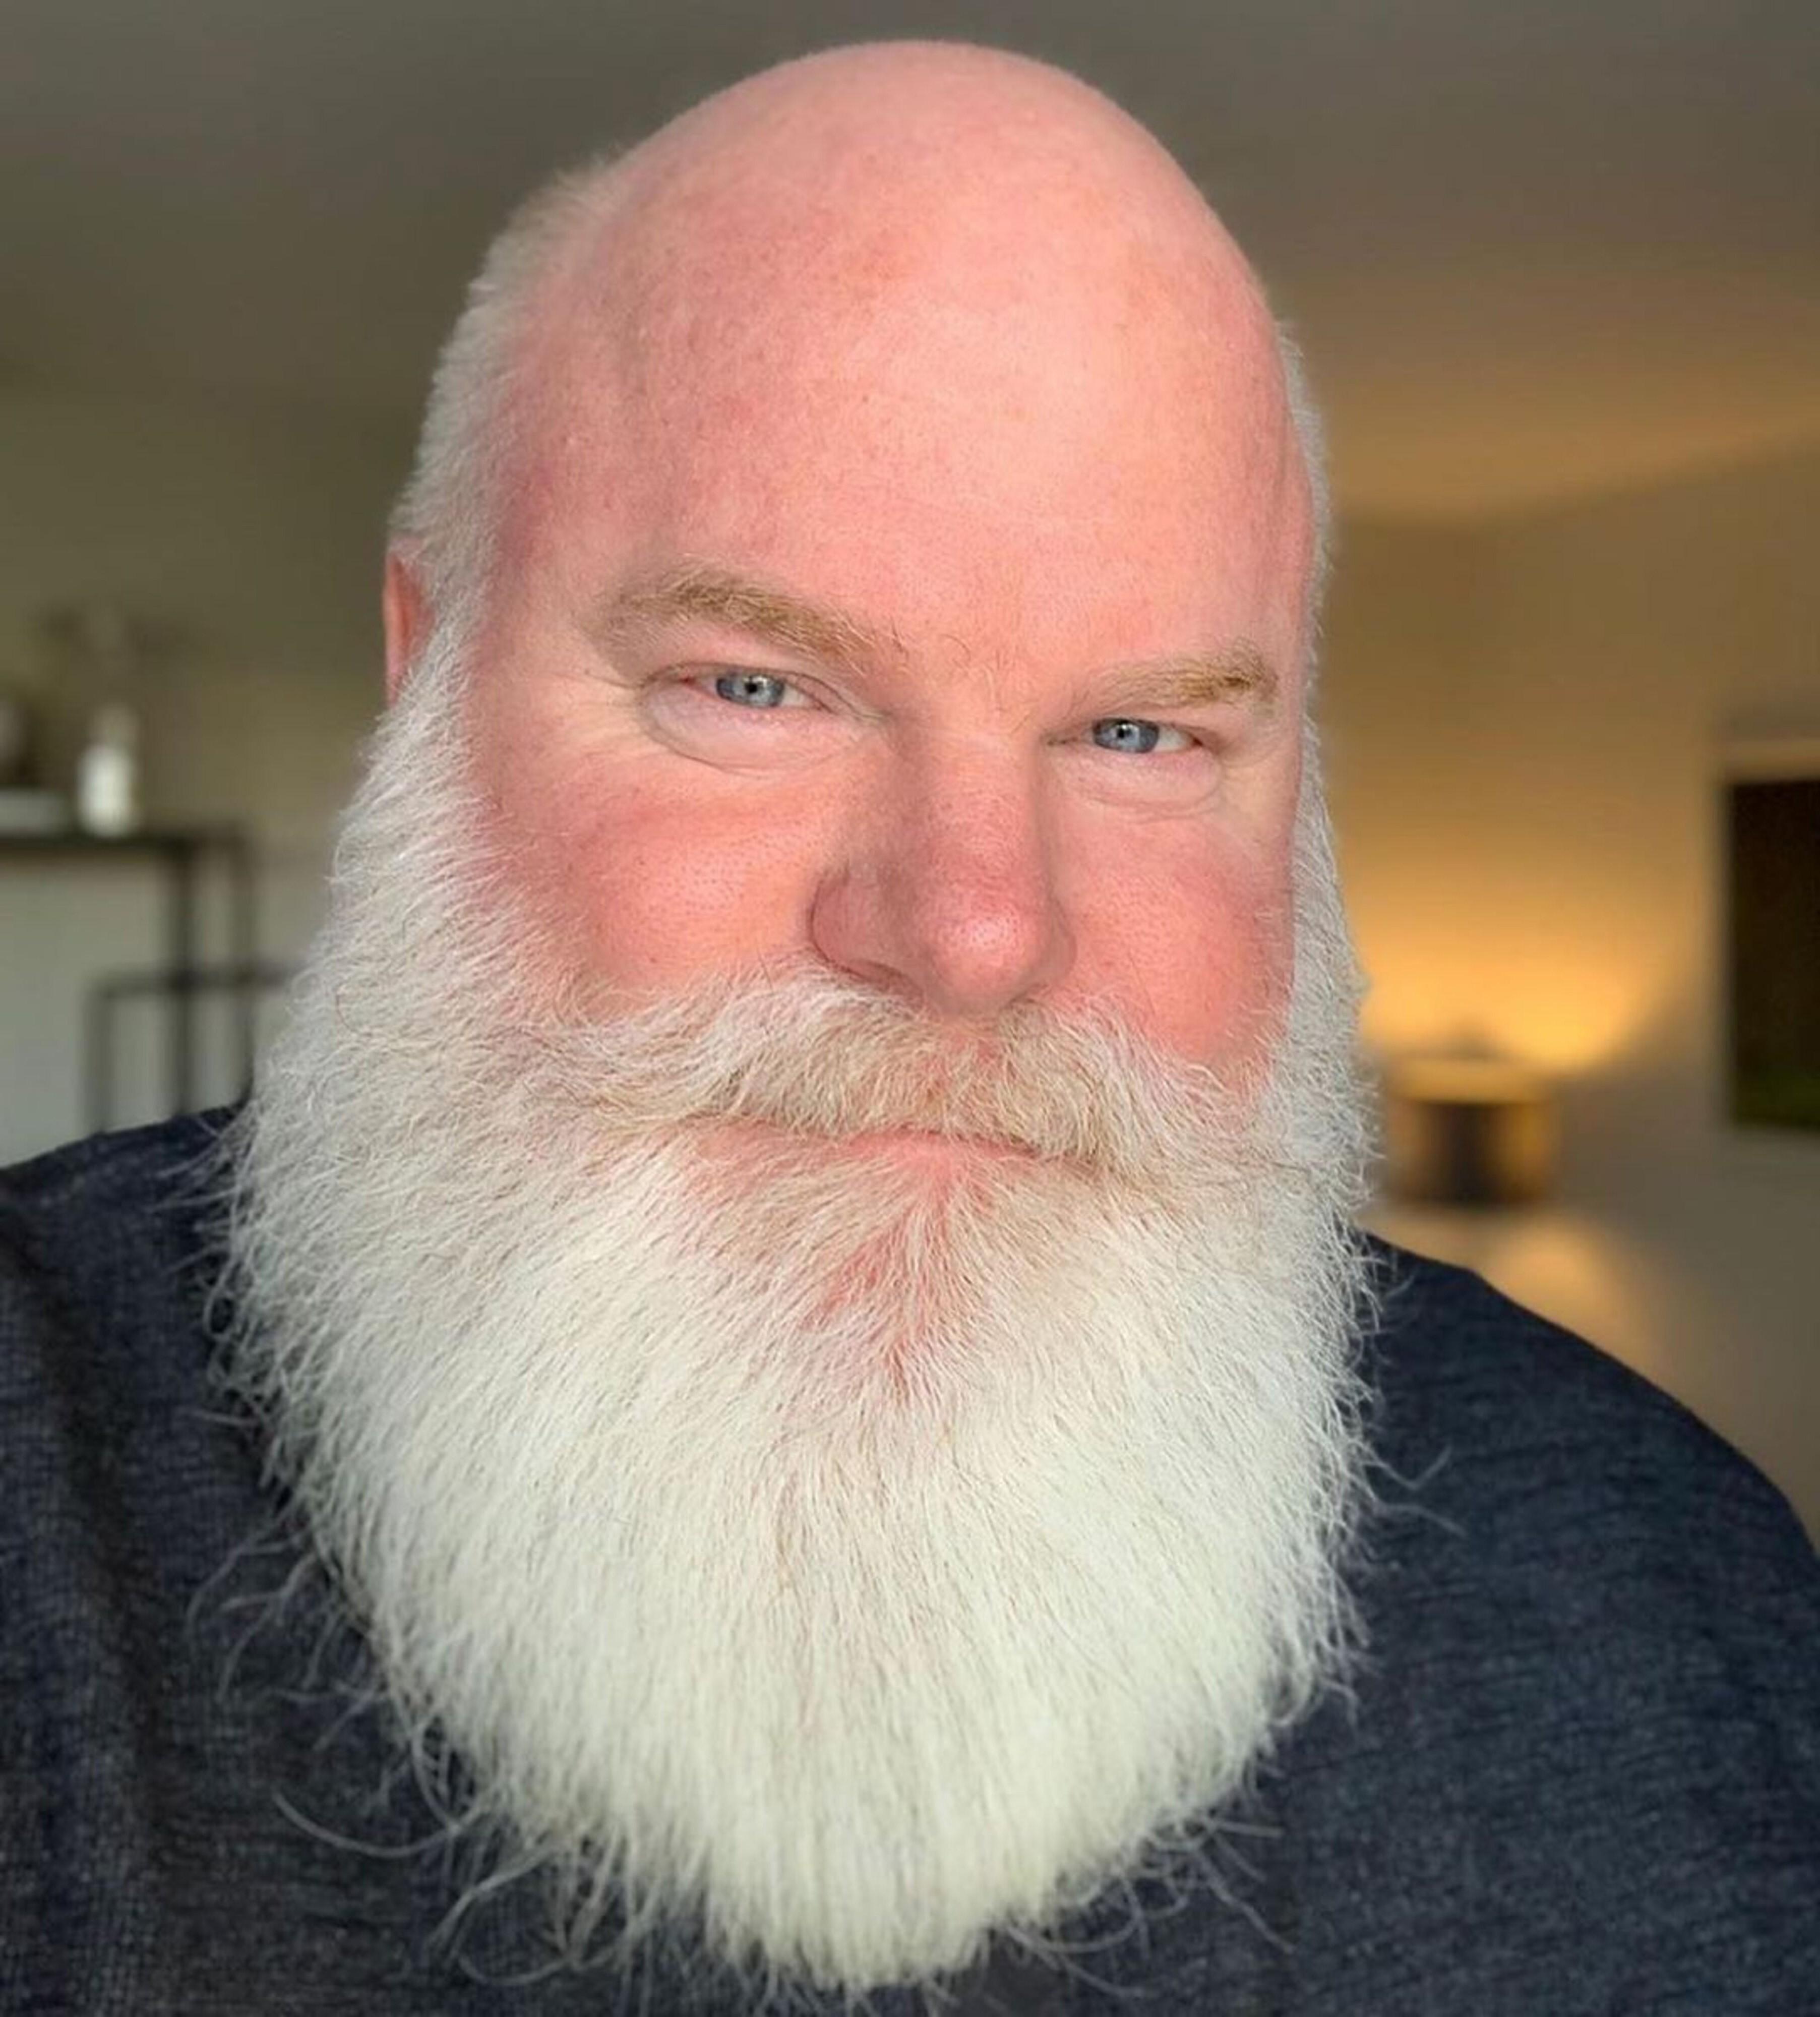 A Lumberjack long beard for men.